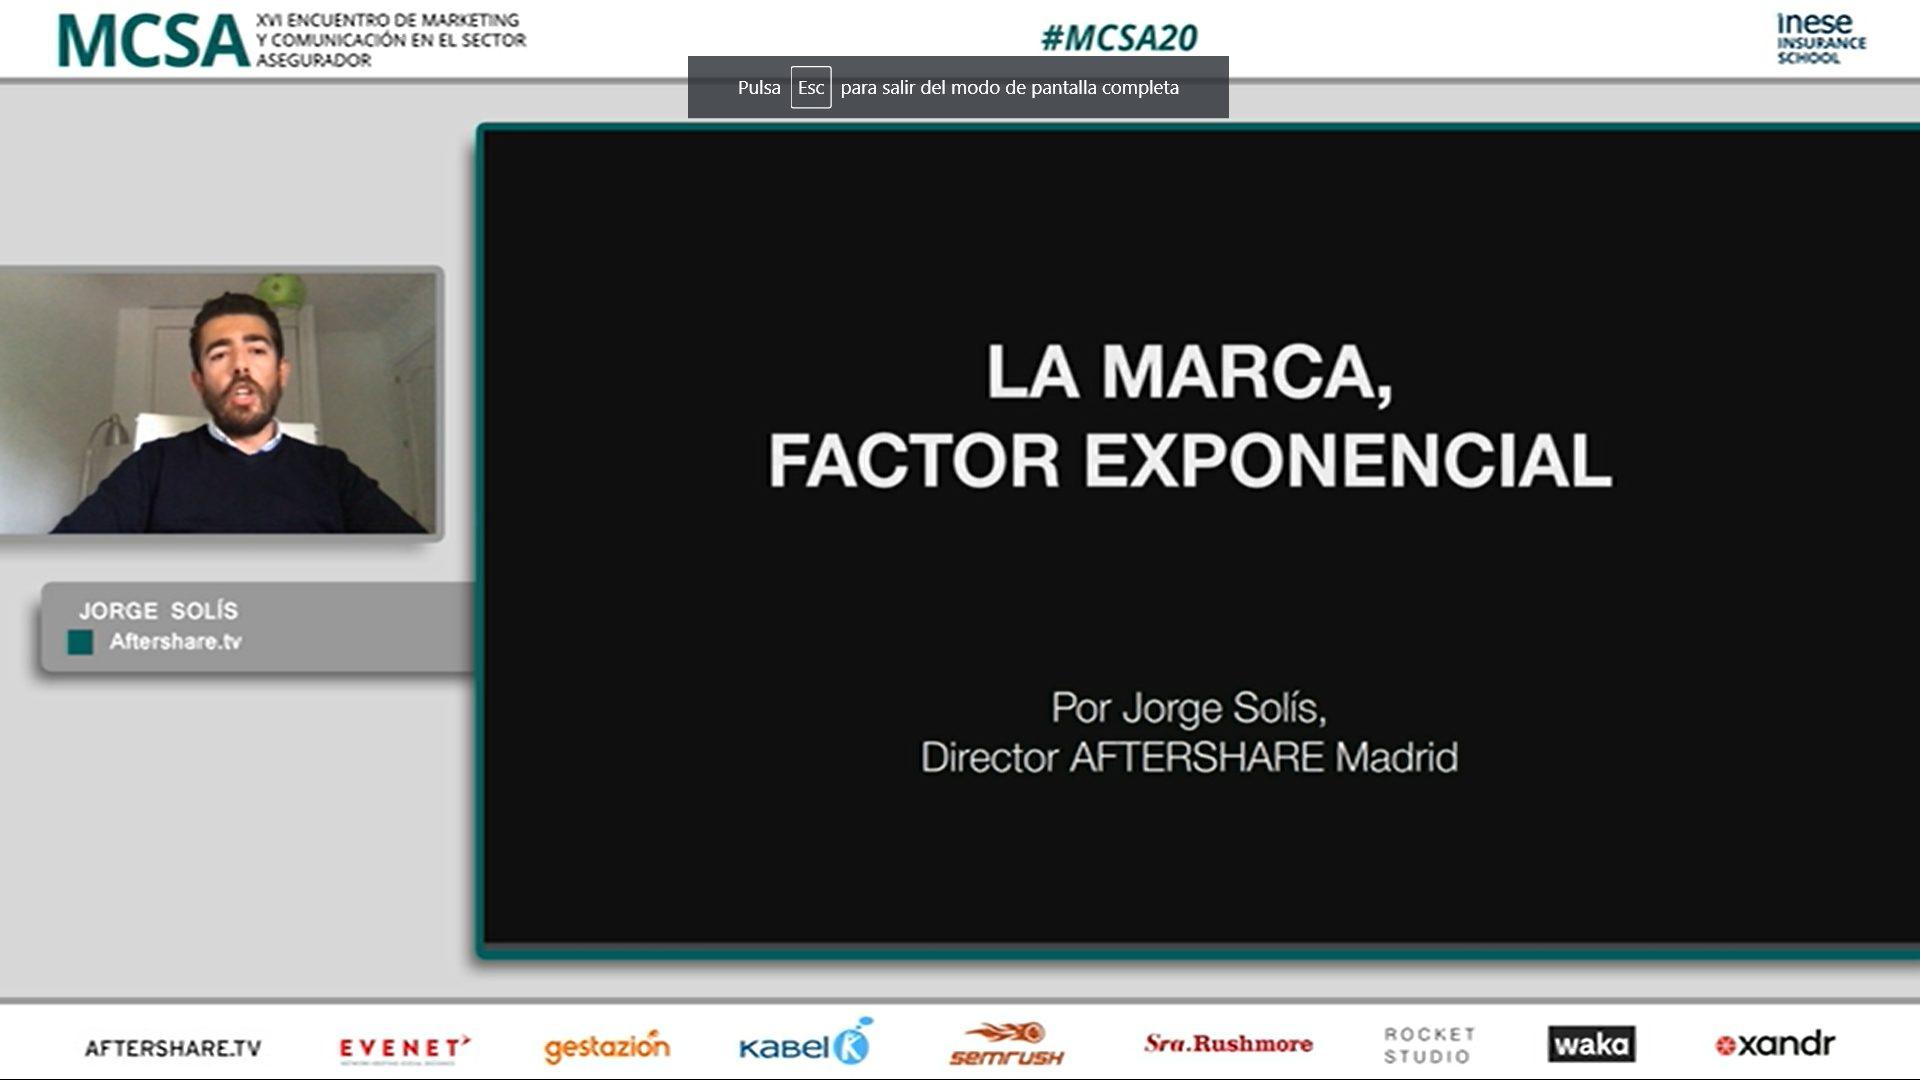 Jorge Solís en el #MCSA20